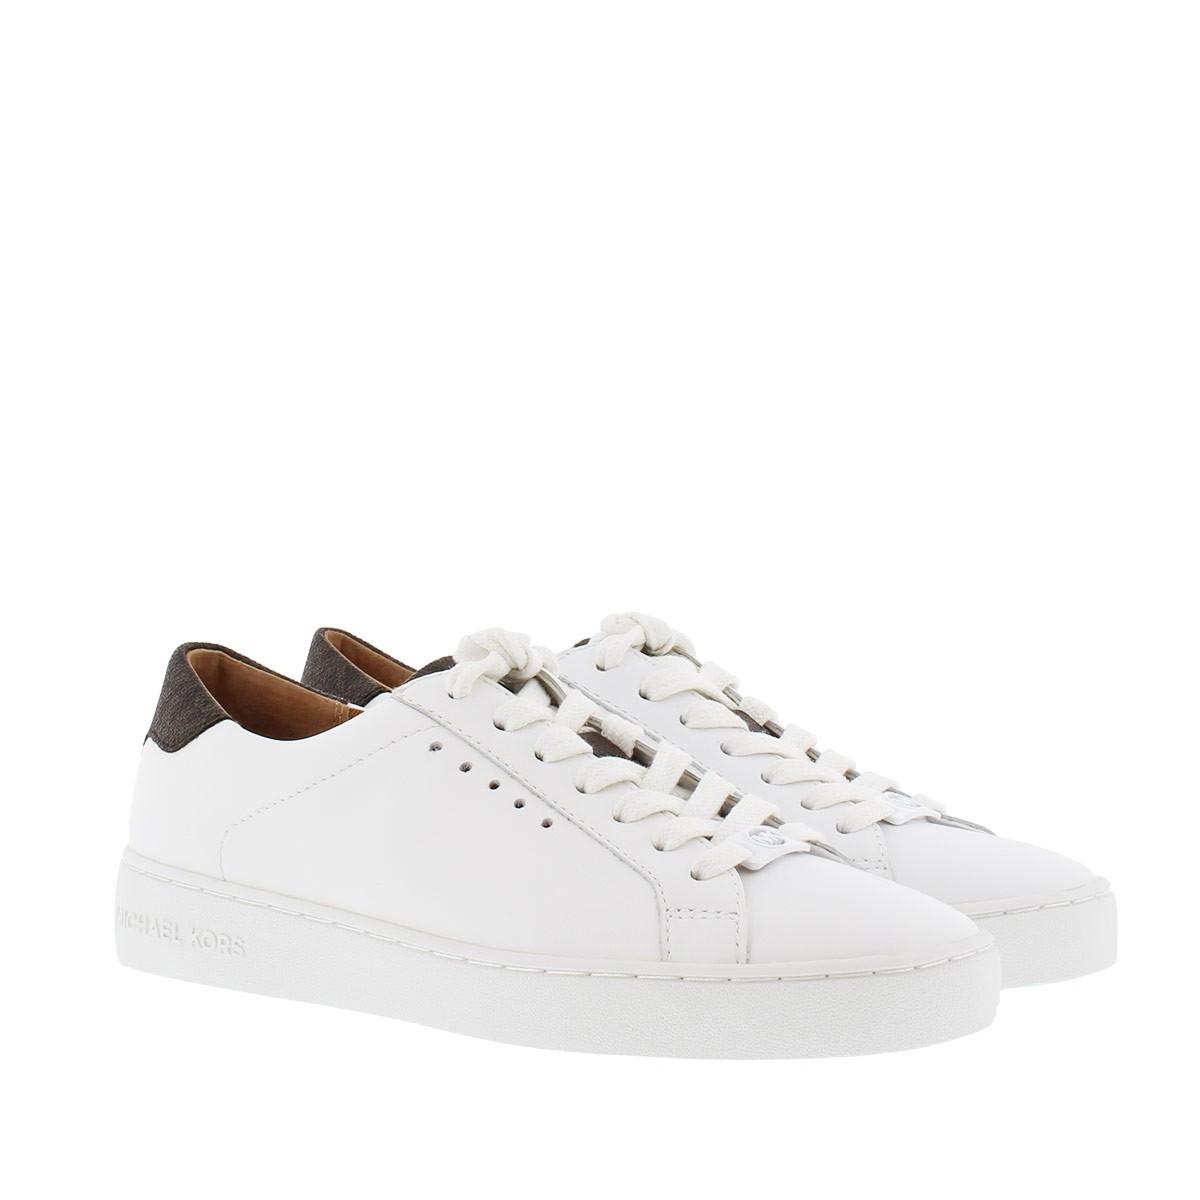 Michael Kors Sneakers - Irving Lace Up Sneaker Optic White/ Brown - in weiß - für Damen